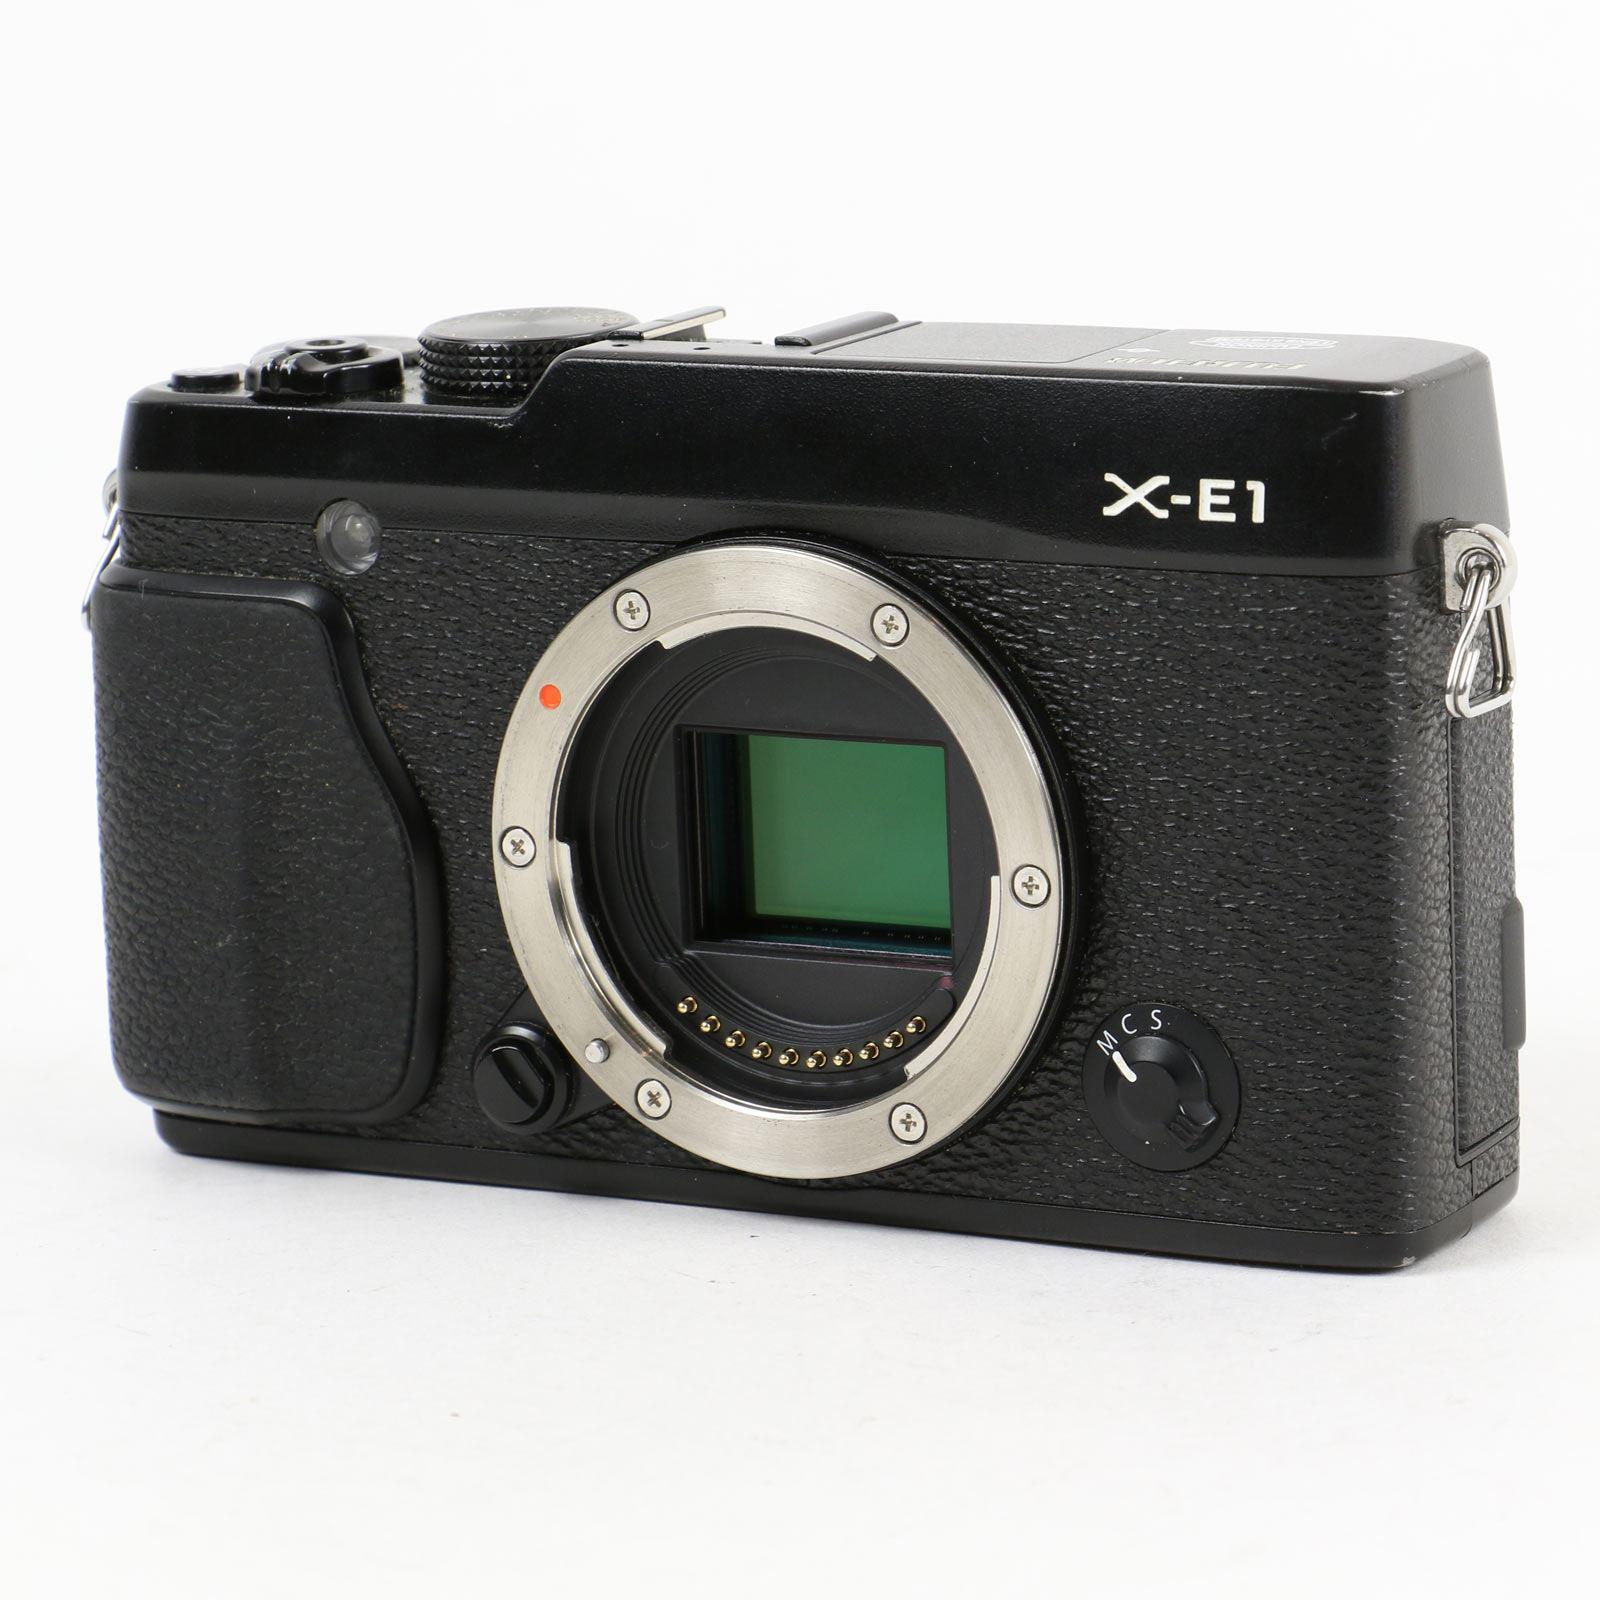 Used Fuji X-E1 Digital Camera Body - Black